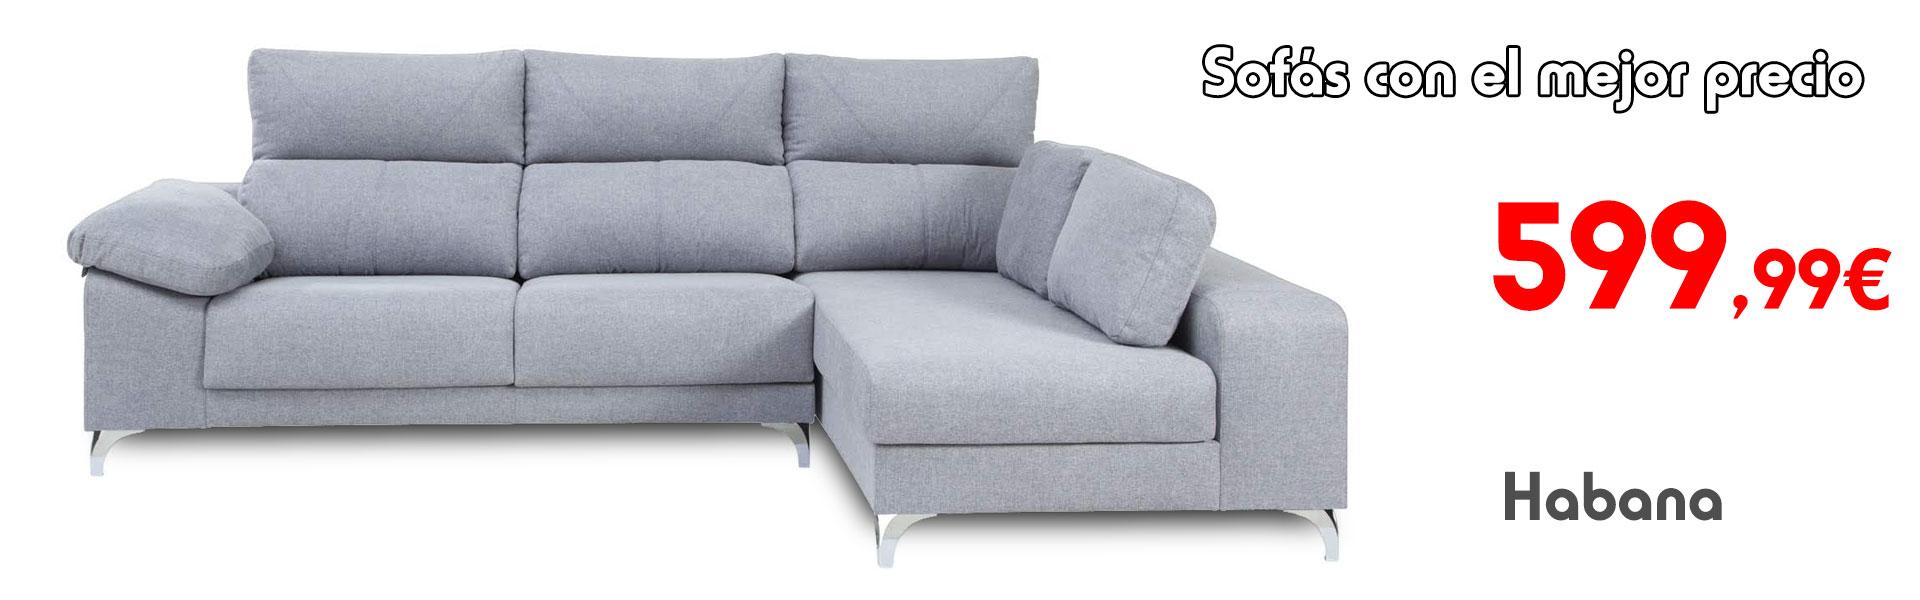 Sofa habana cuba bela 5